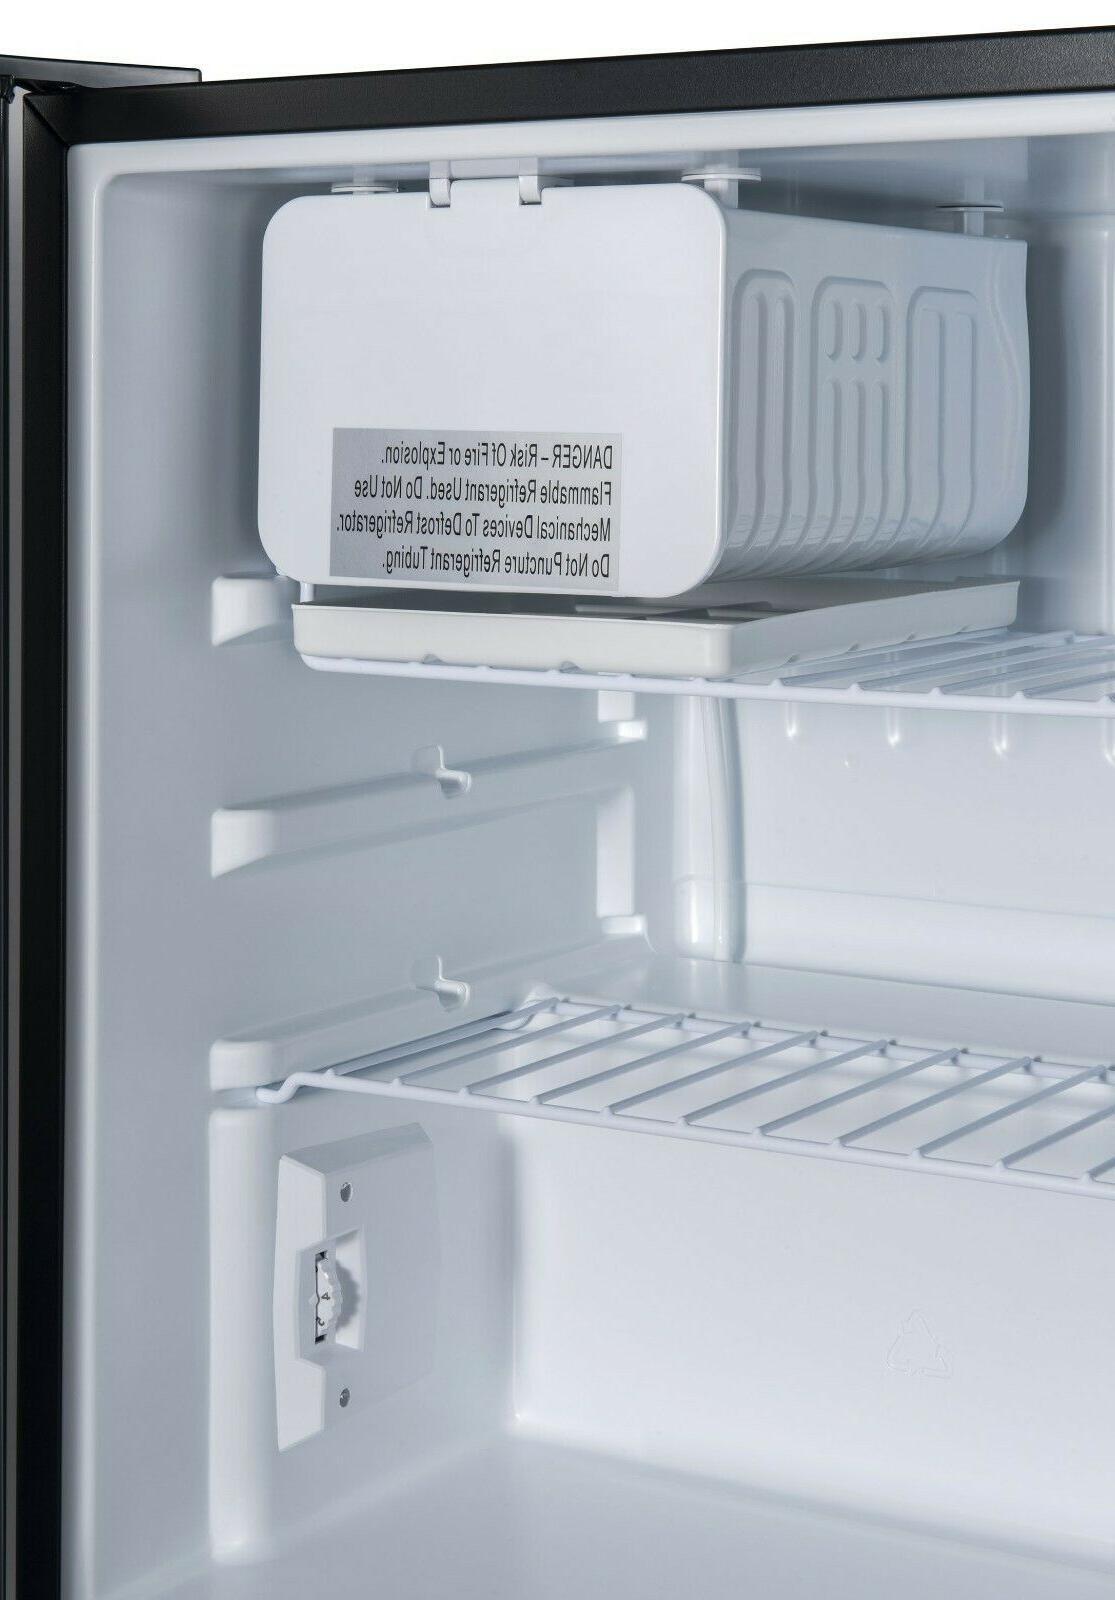 Galanz 2.7 Cu Single Door Freezer Small Stainless Steel